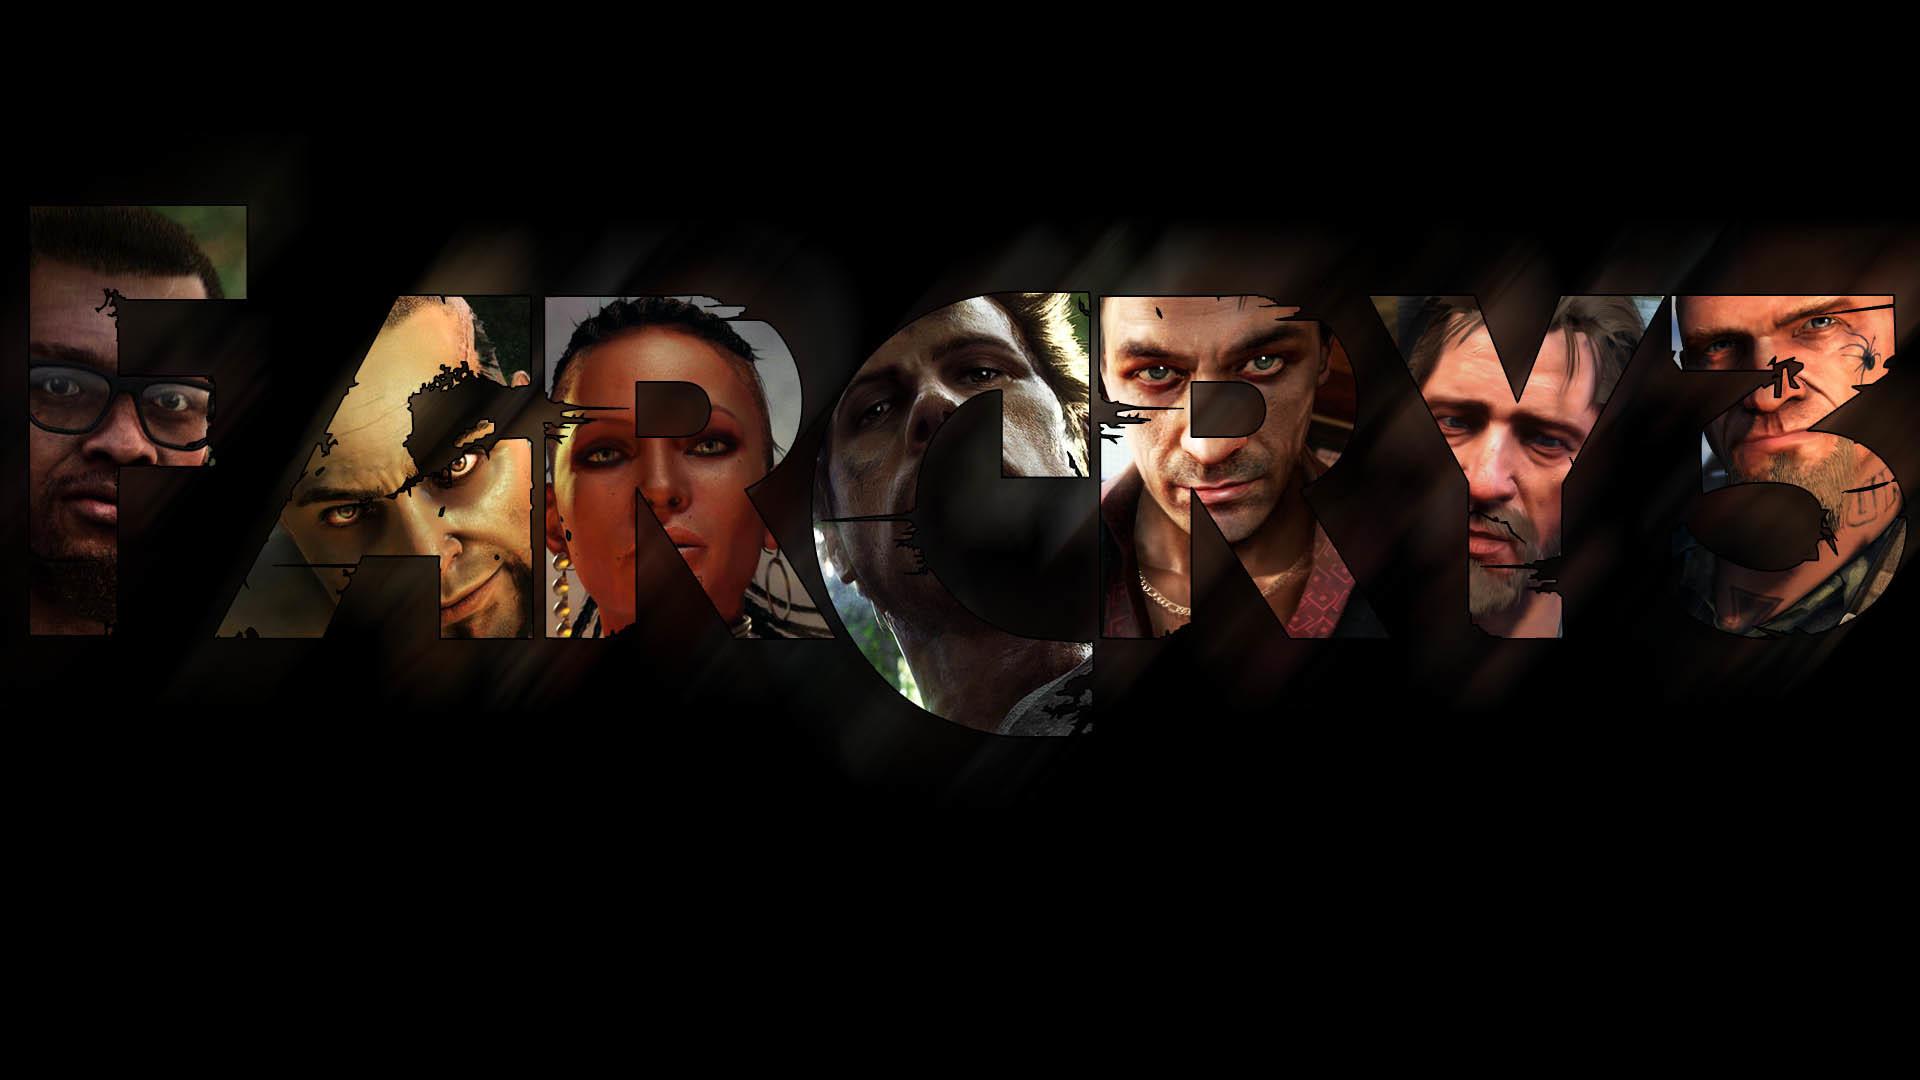 Video Game – Far Cry 3 Bakgrund